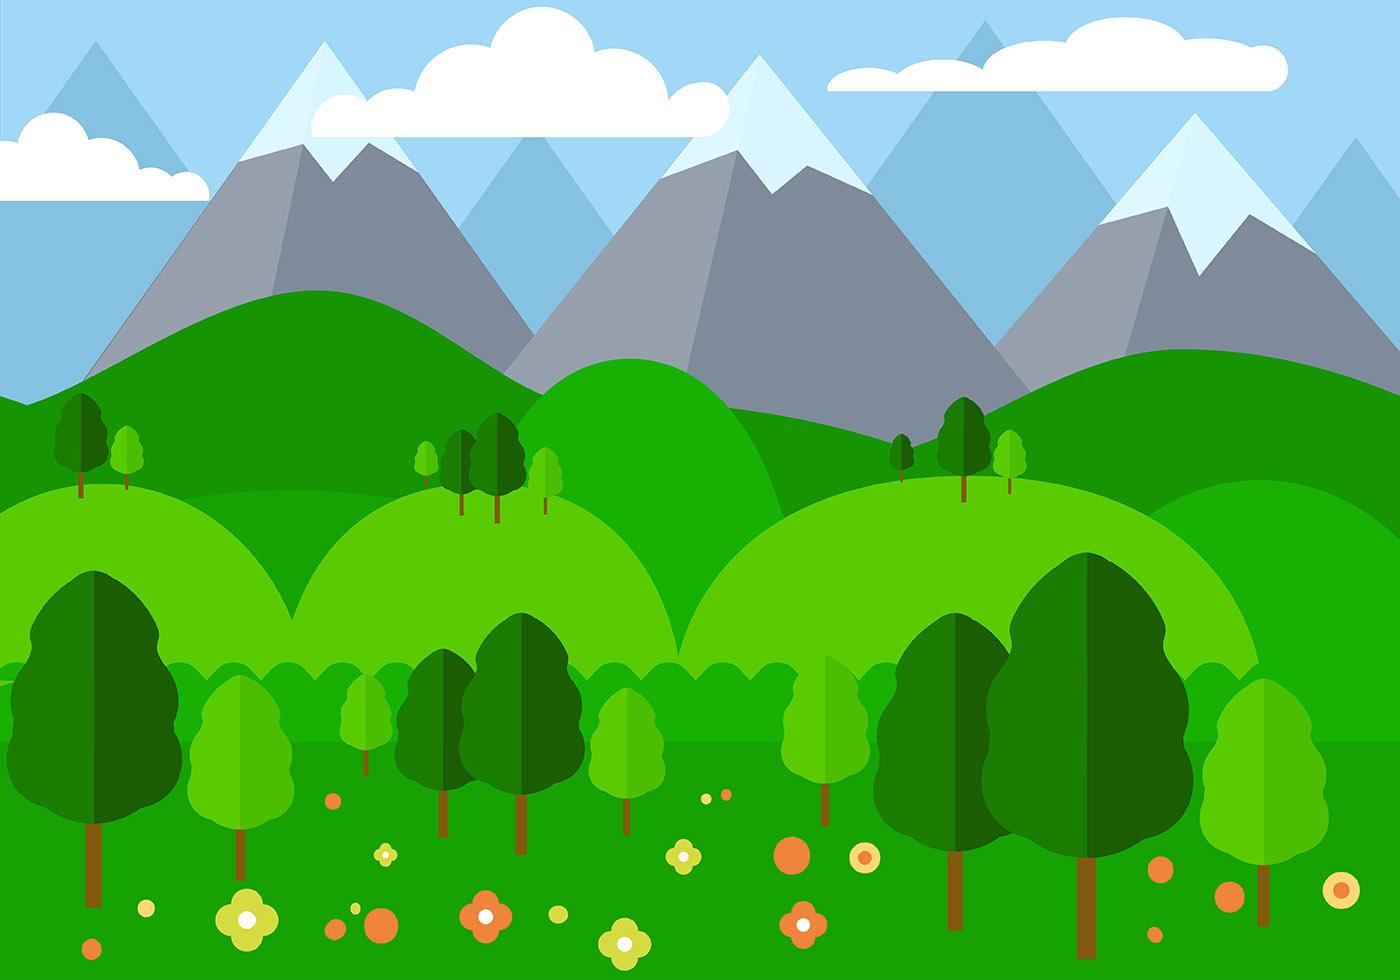 Landscape Illustration Vector Free: Free Flat Design Vector Landscape Illustration